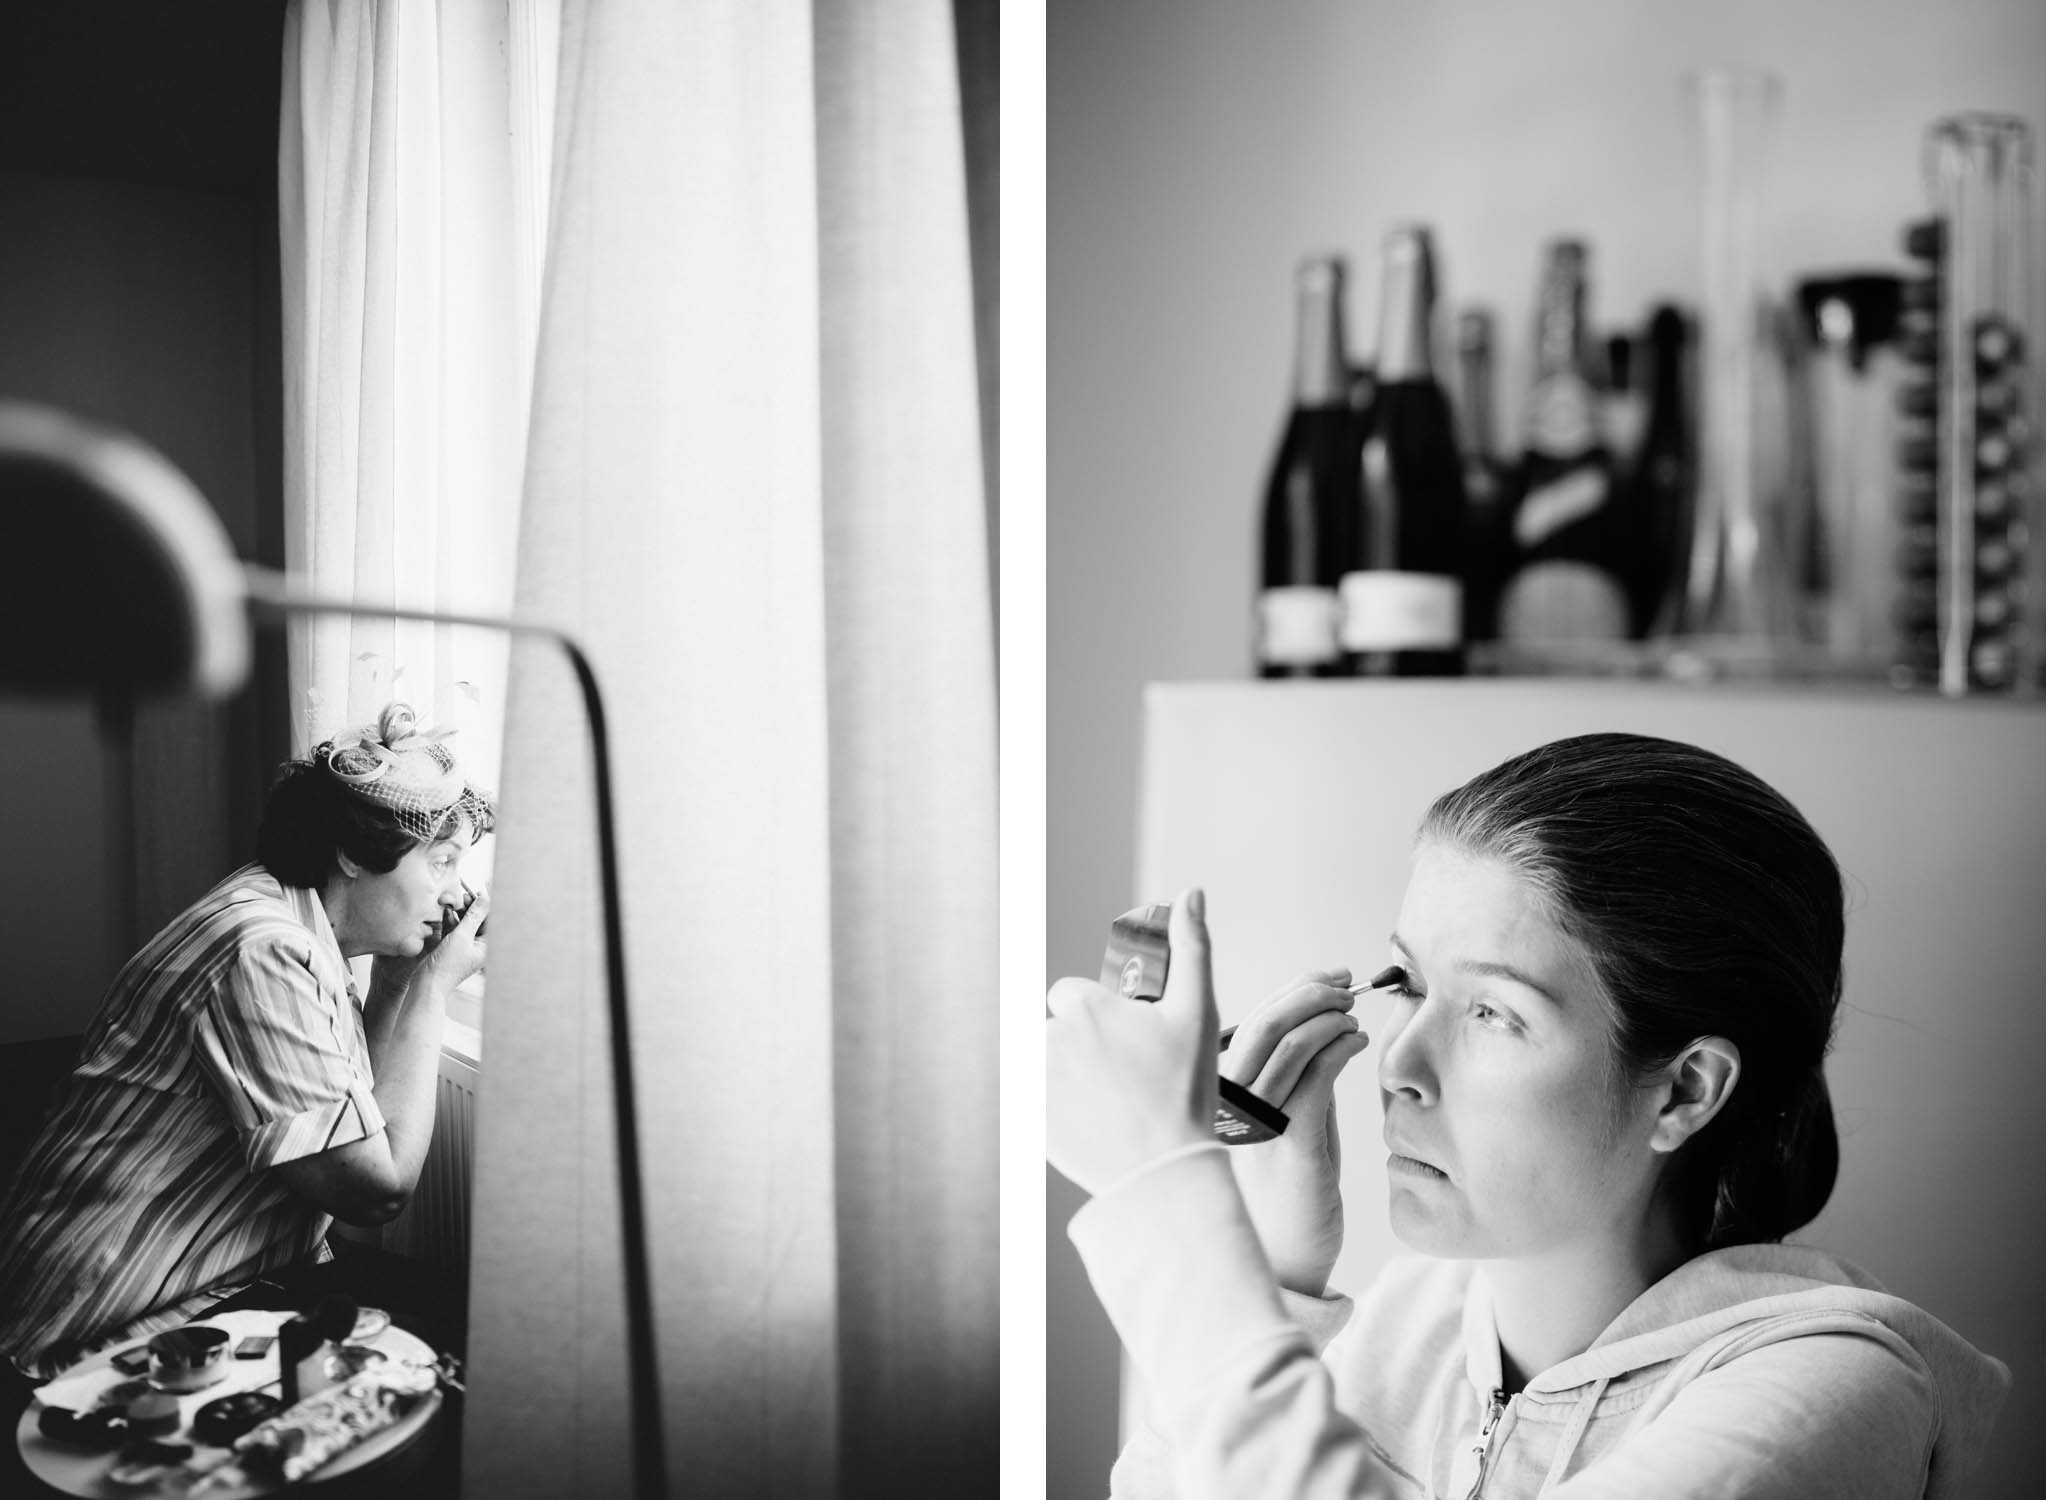 hochzeit-getting-ready-fotograf-münchen